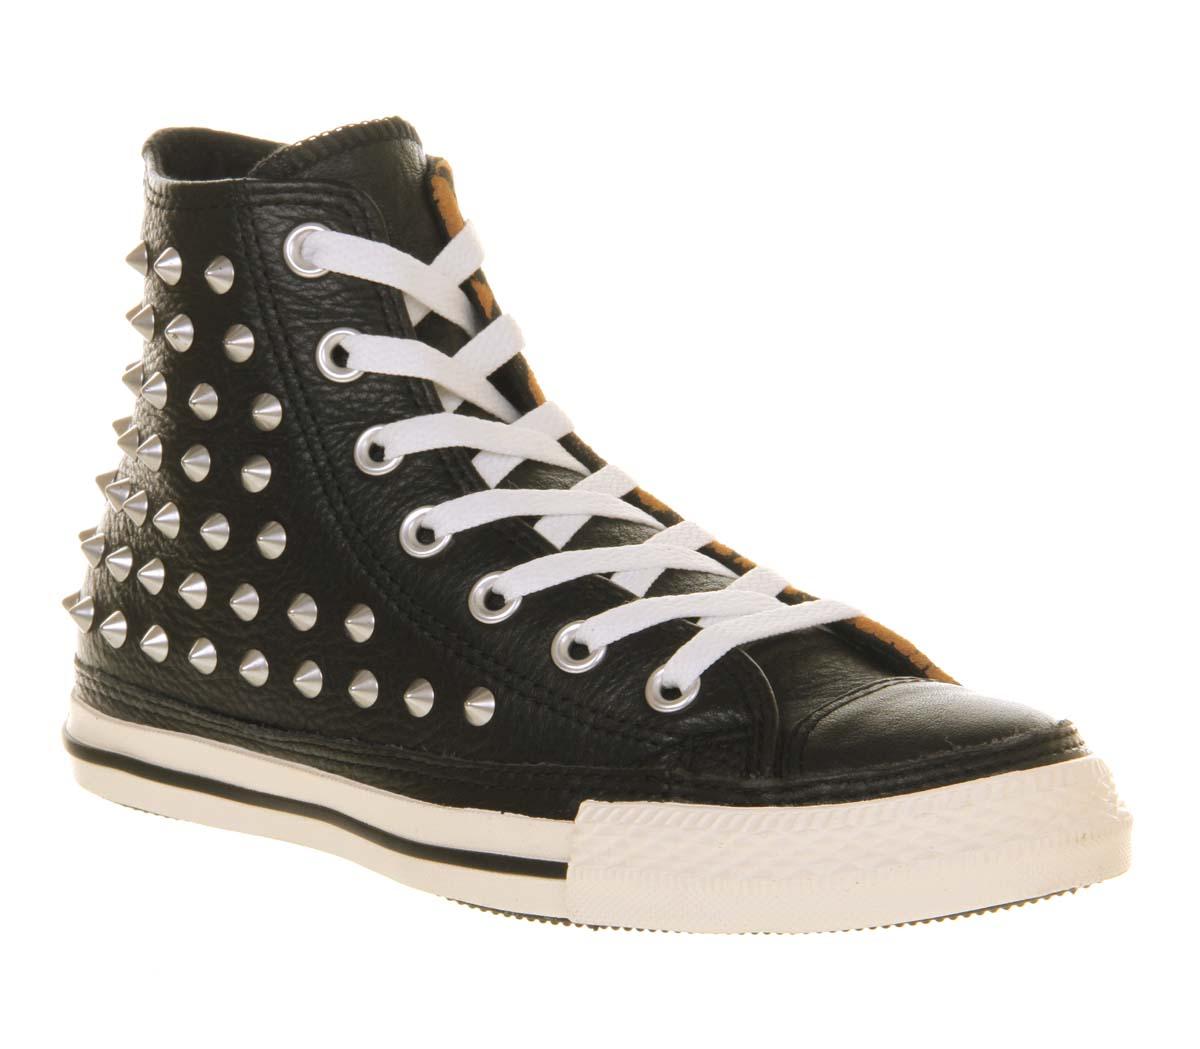 Converse Mens Shoes Ebay